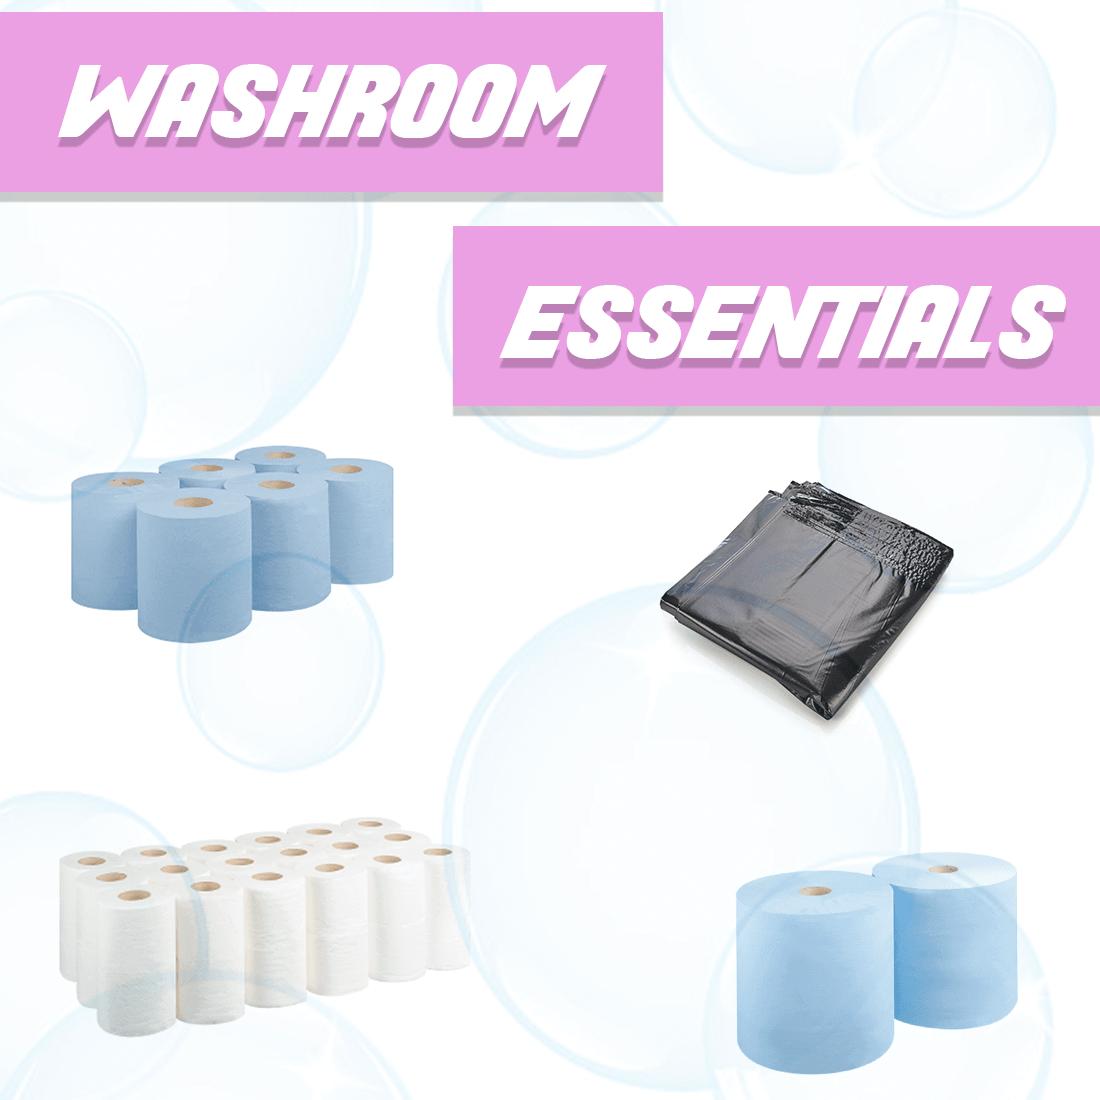 Washroom Essentials